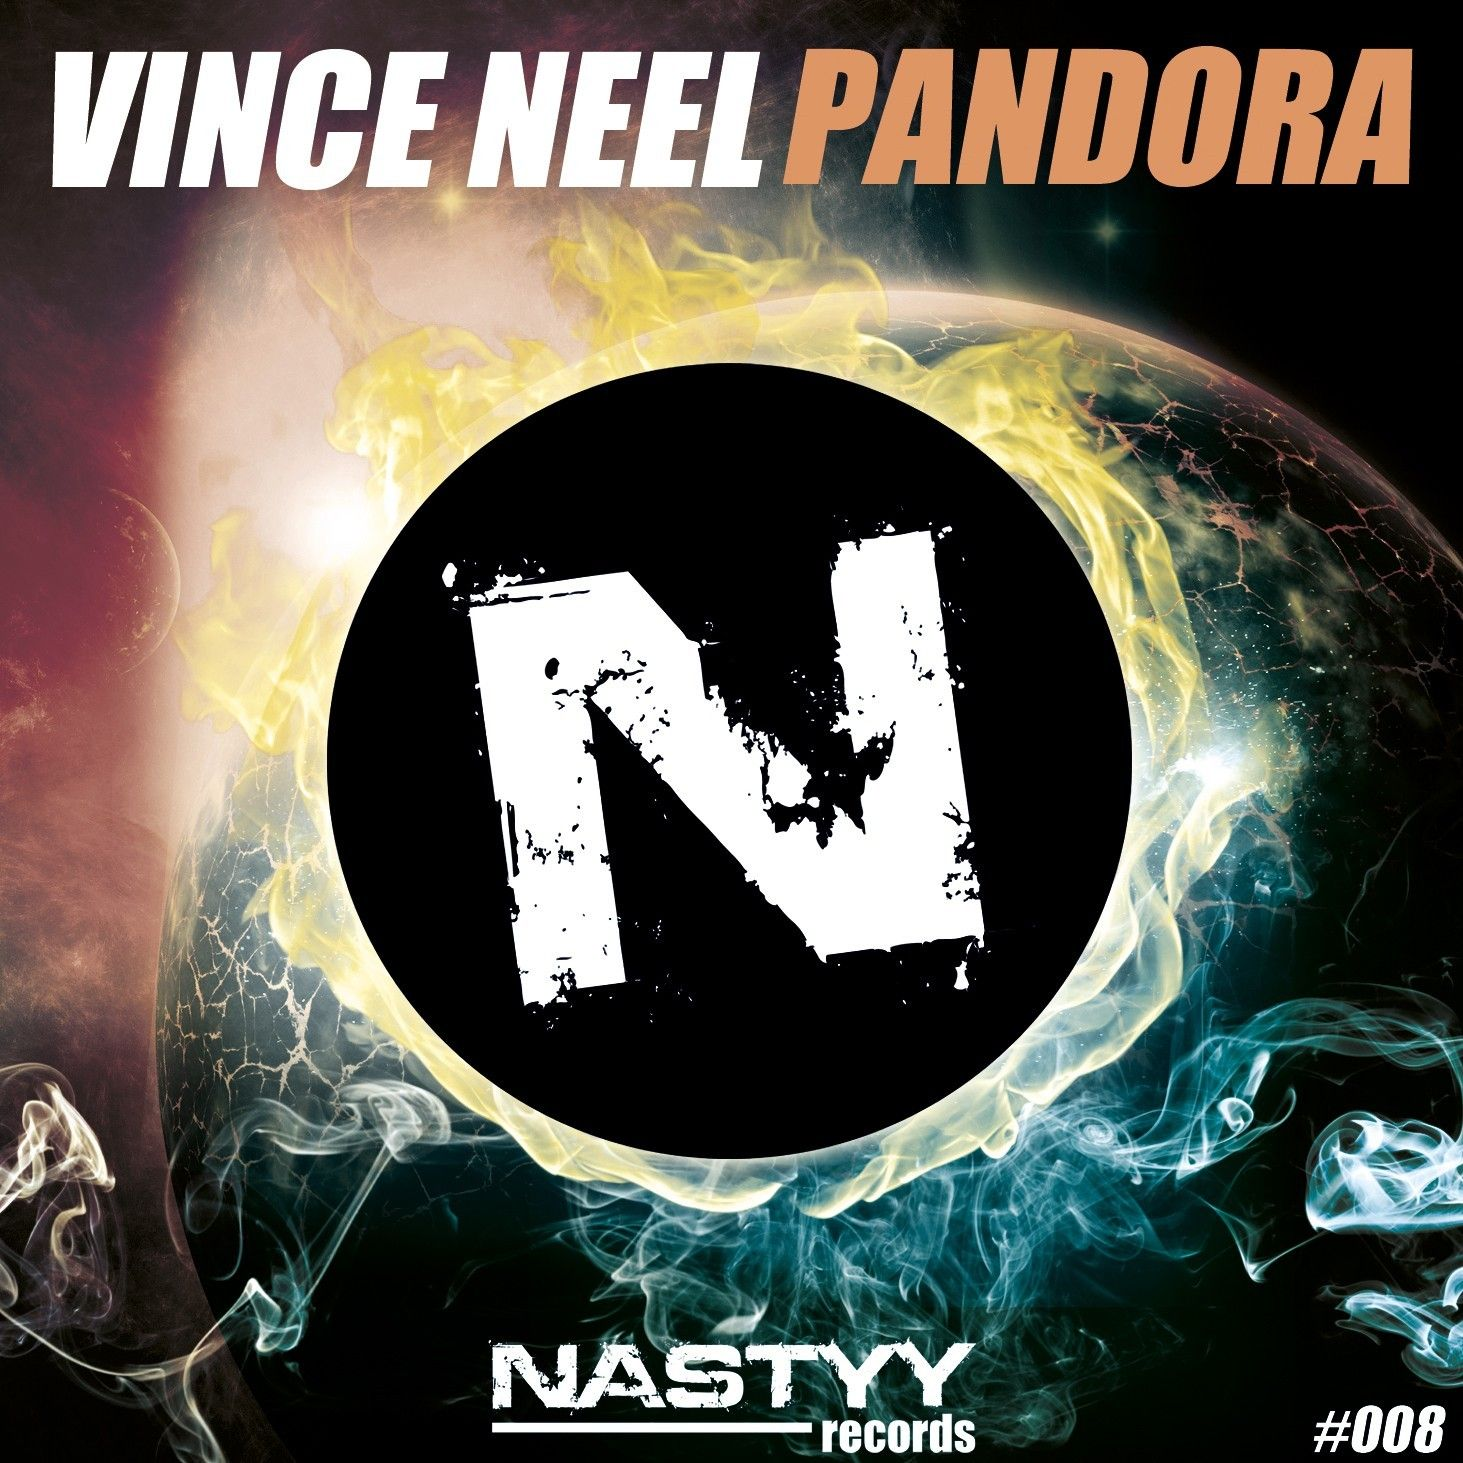 vince-neel-pandora-cover.jpg